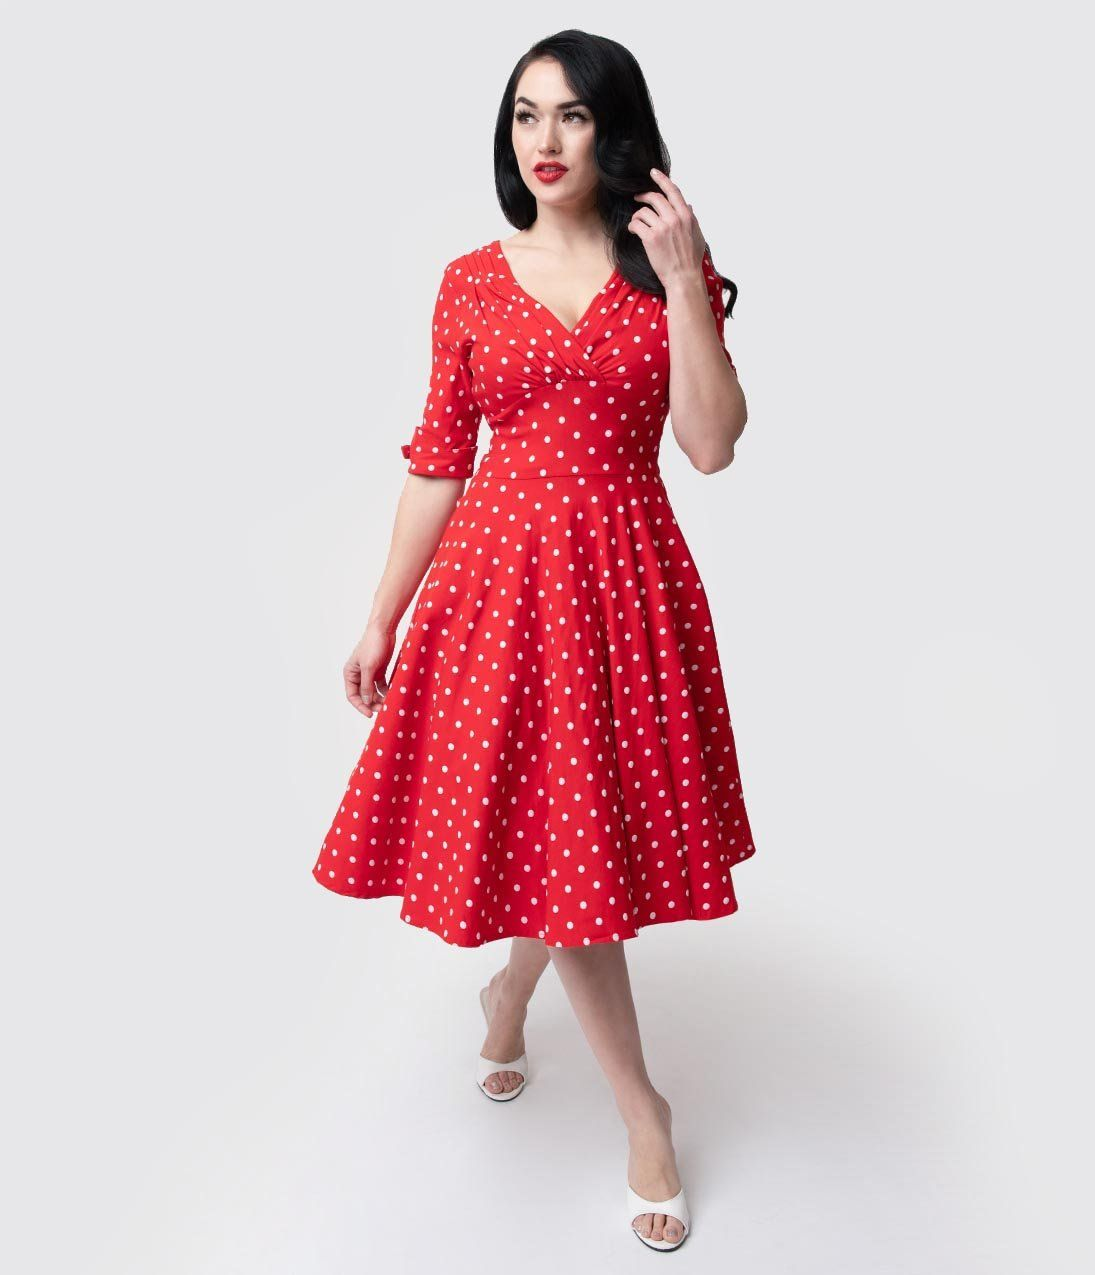 Vintage Polka Dot Dresses 50s Spotty And Ditsy Prints Vintage Dresses Online Vintage Polka Dot Dress Fifties Dress [ 1275 x 1095 Pixel ]